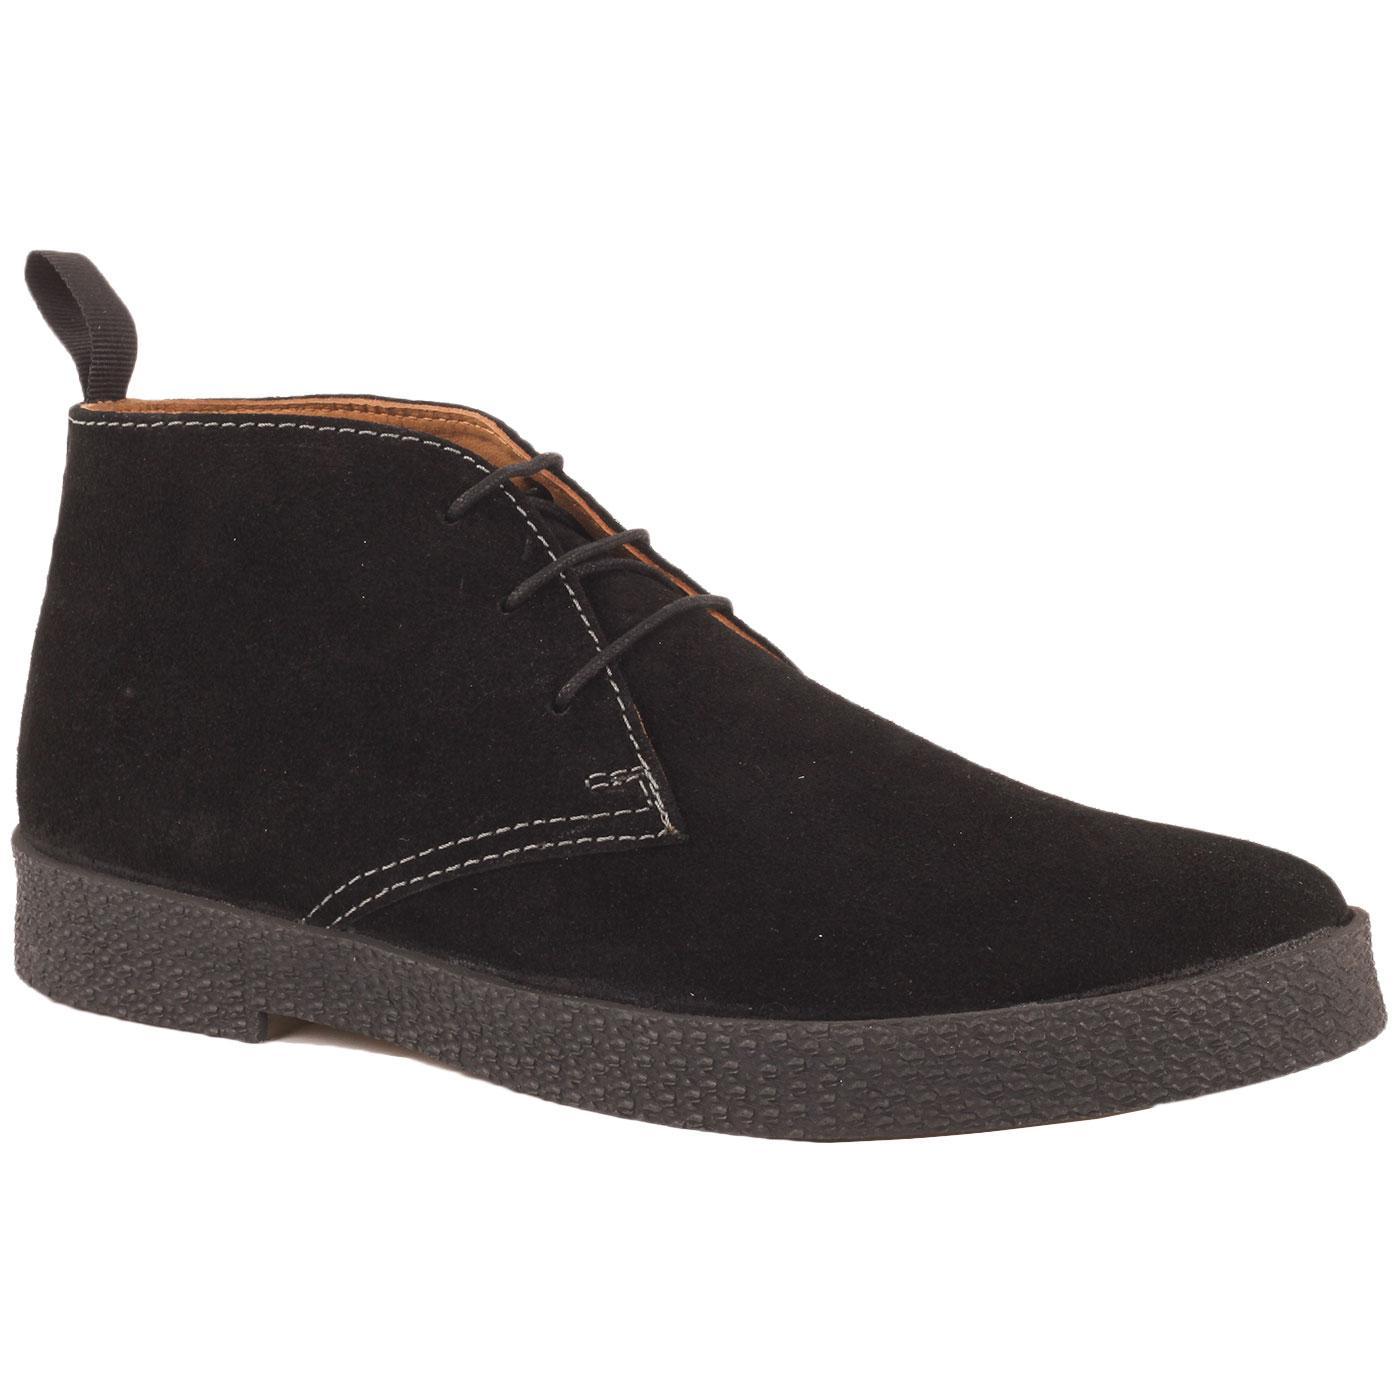 Madcap England Cisco 60s Mod Suede Playboy Chukka Boots in Black